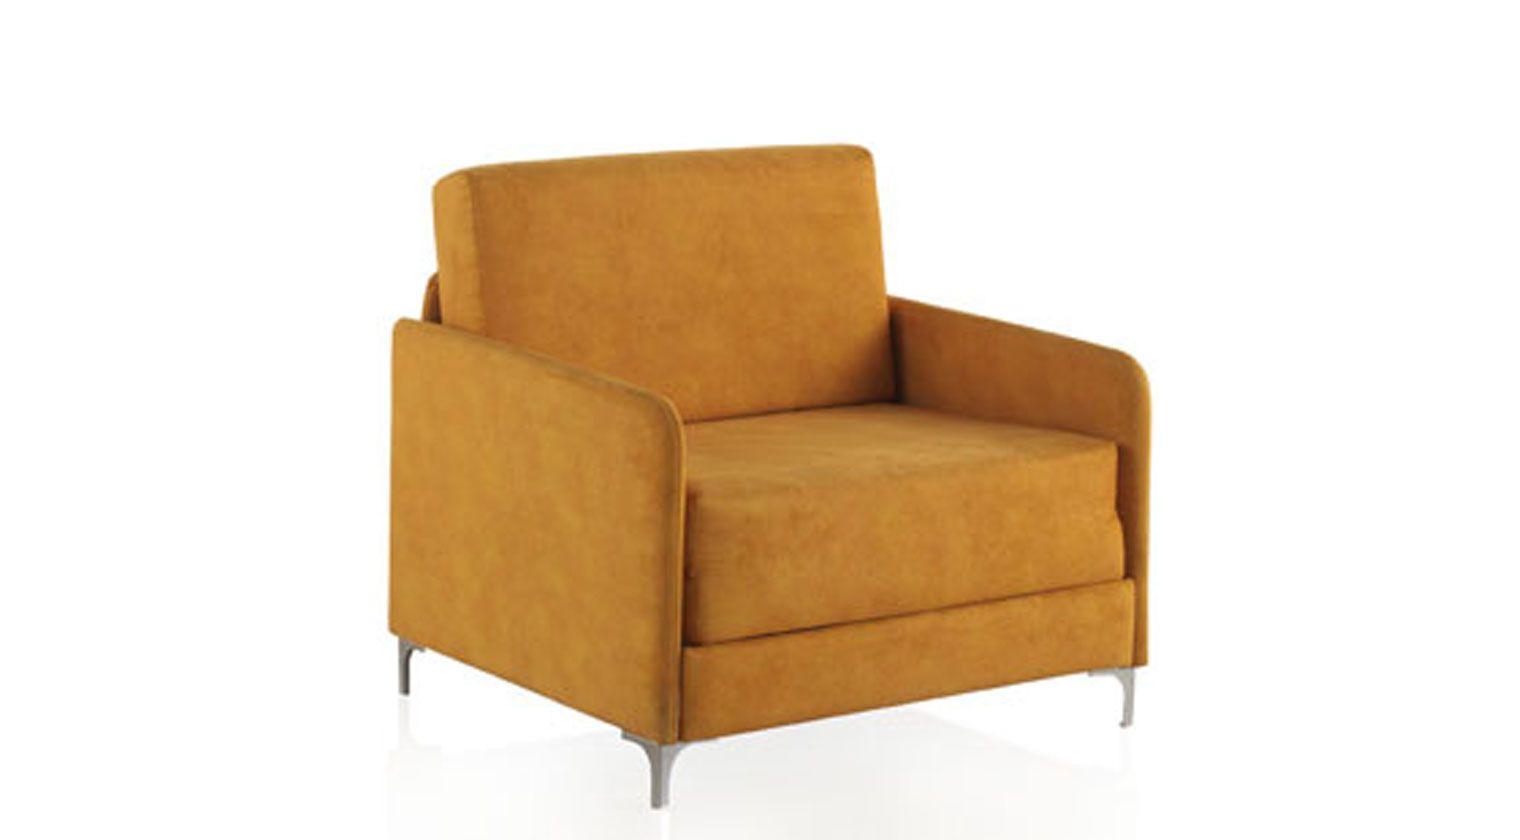 Sof cama nancy sofas cama extensible nido for Sofas extensibles baratos